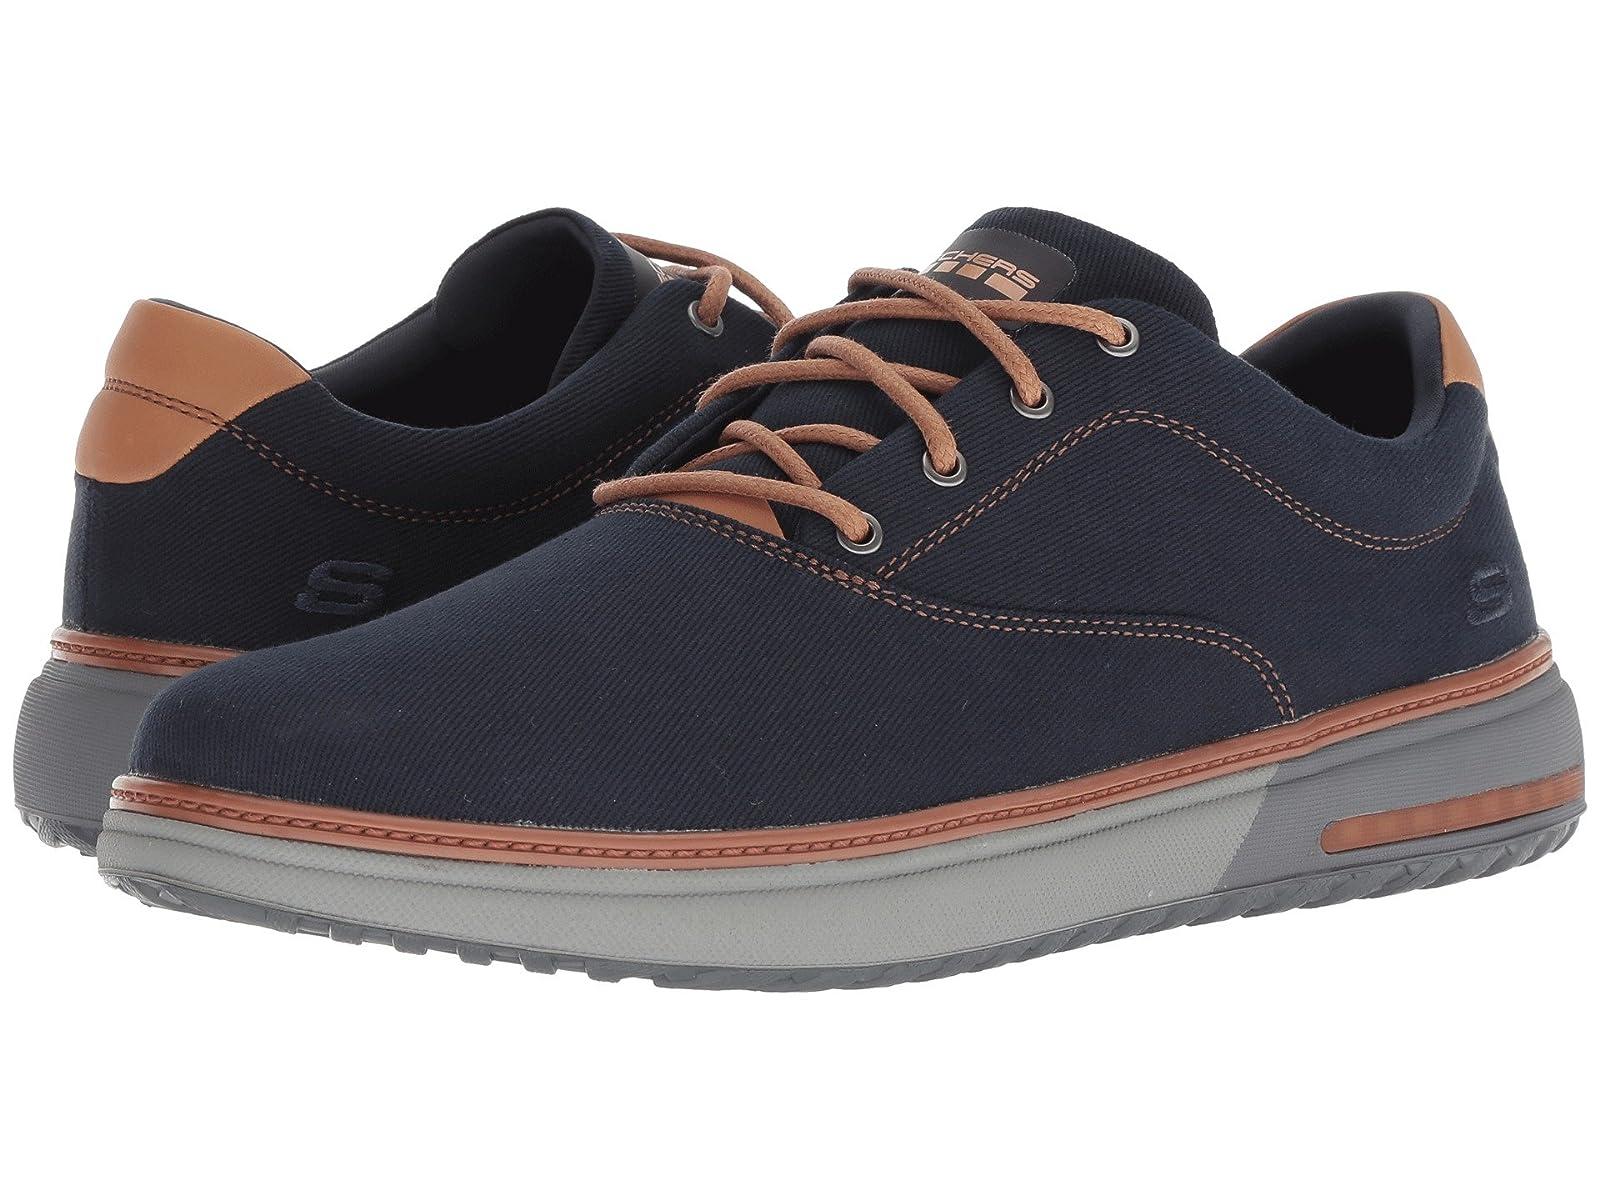 SKECHERS Folten - VeromeCheap and distinctive eye-catching shoes